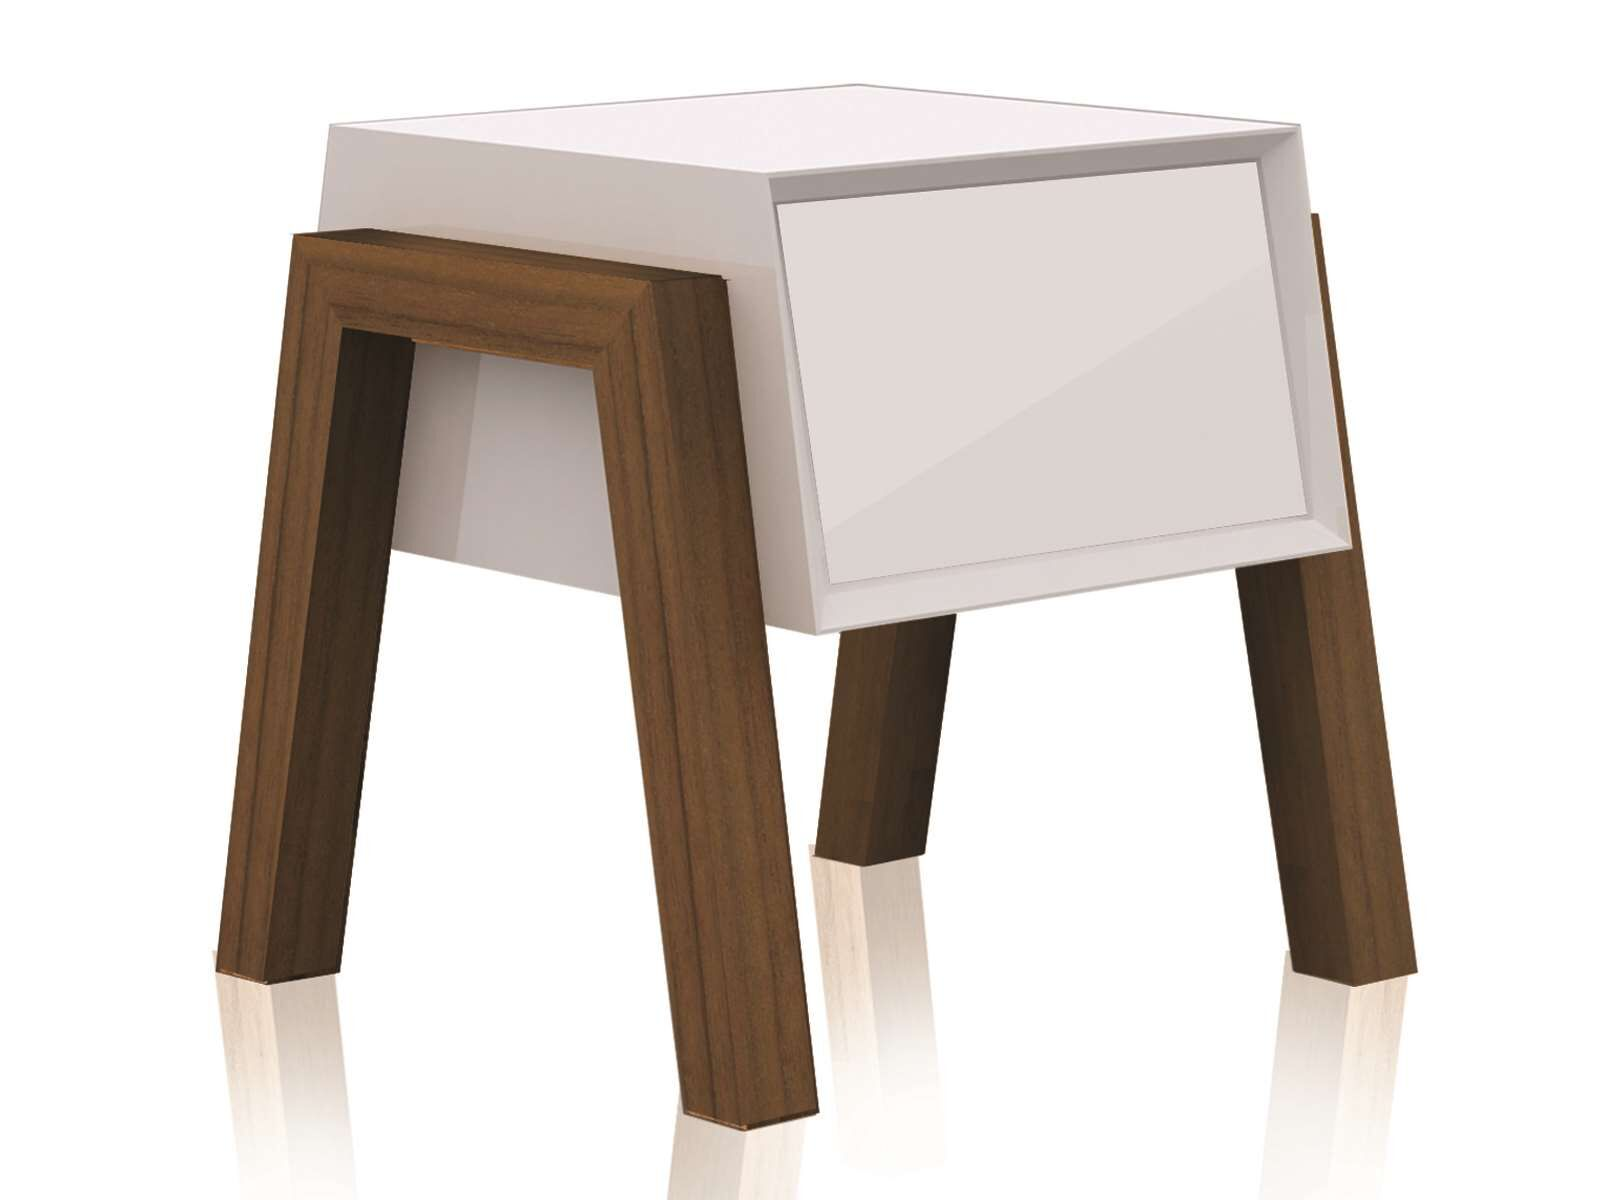 Figo End Table Color: White